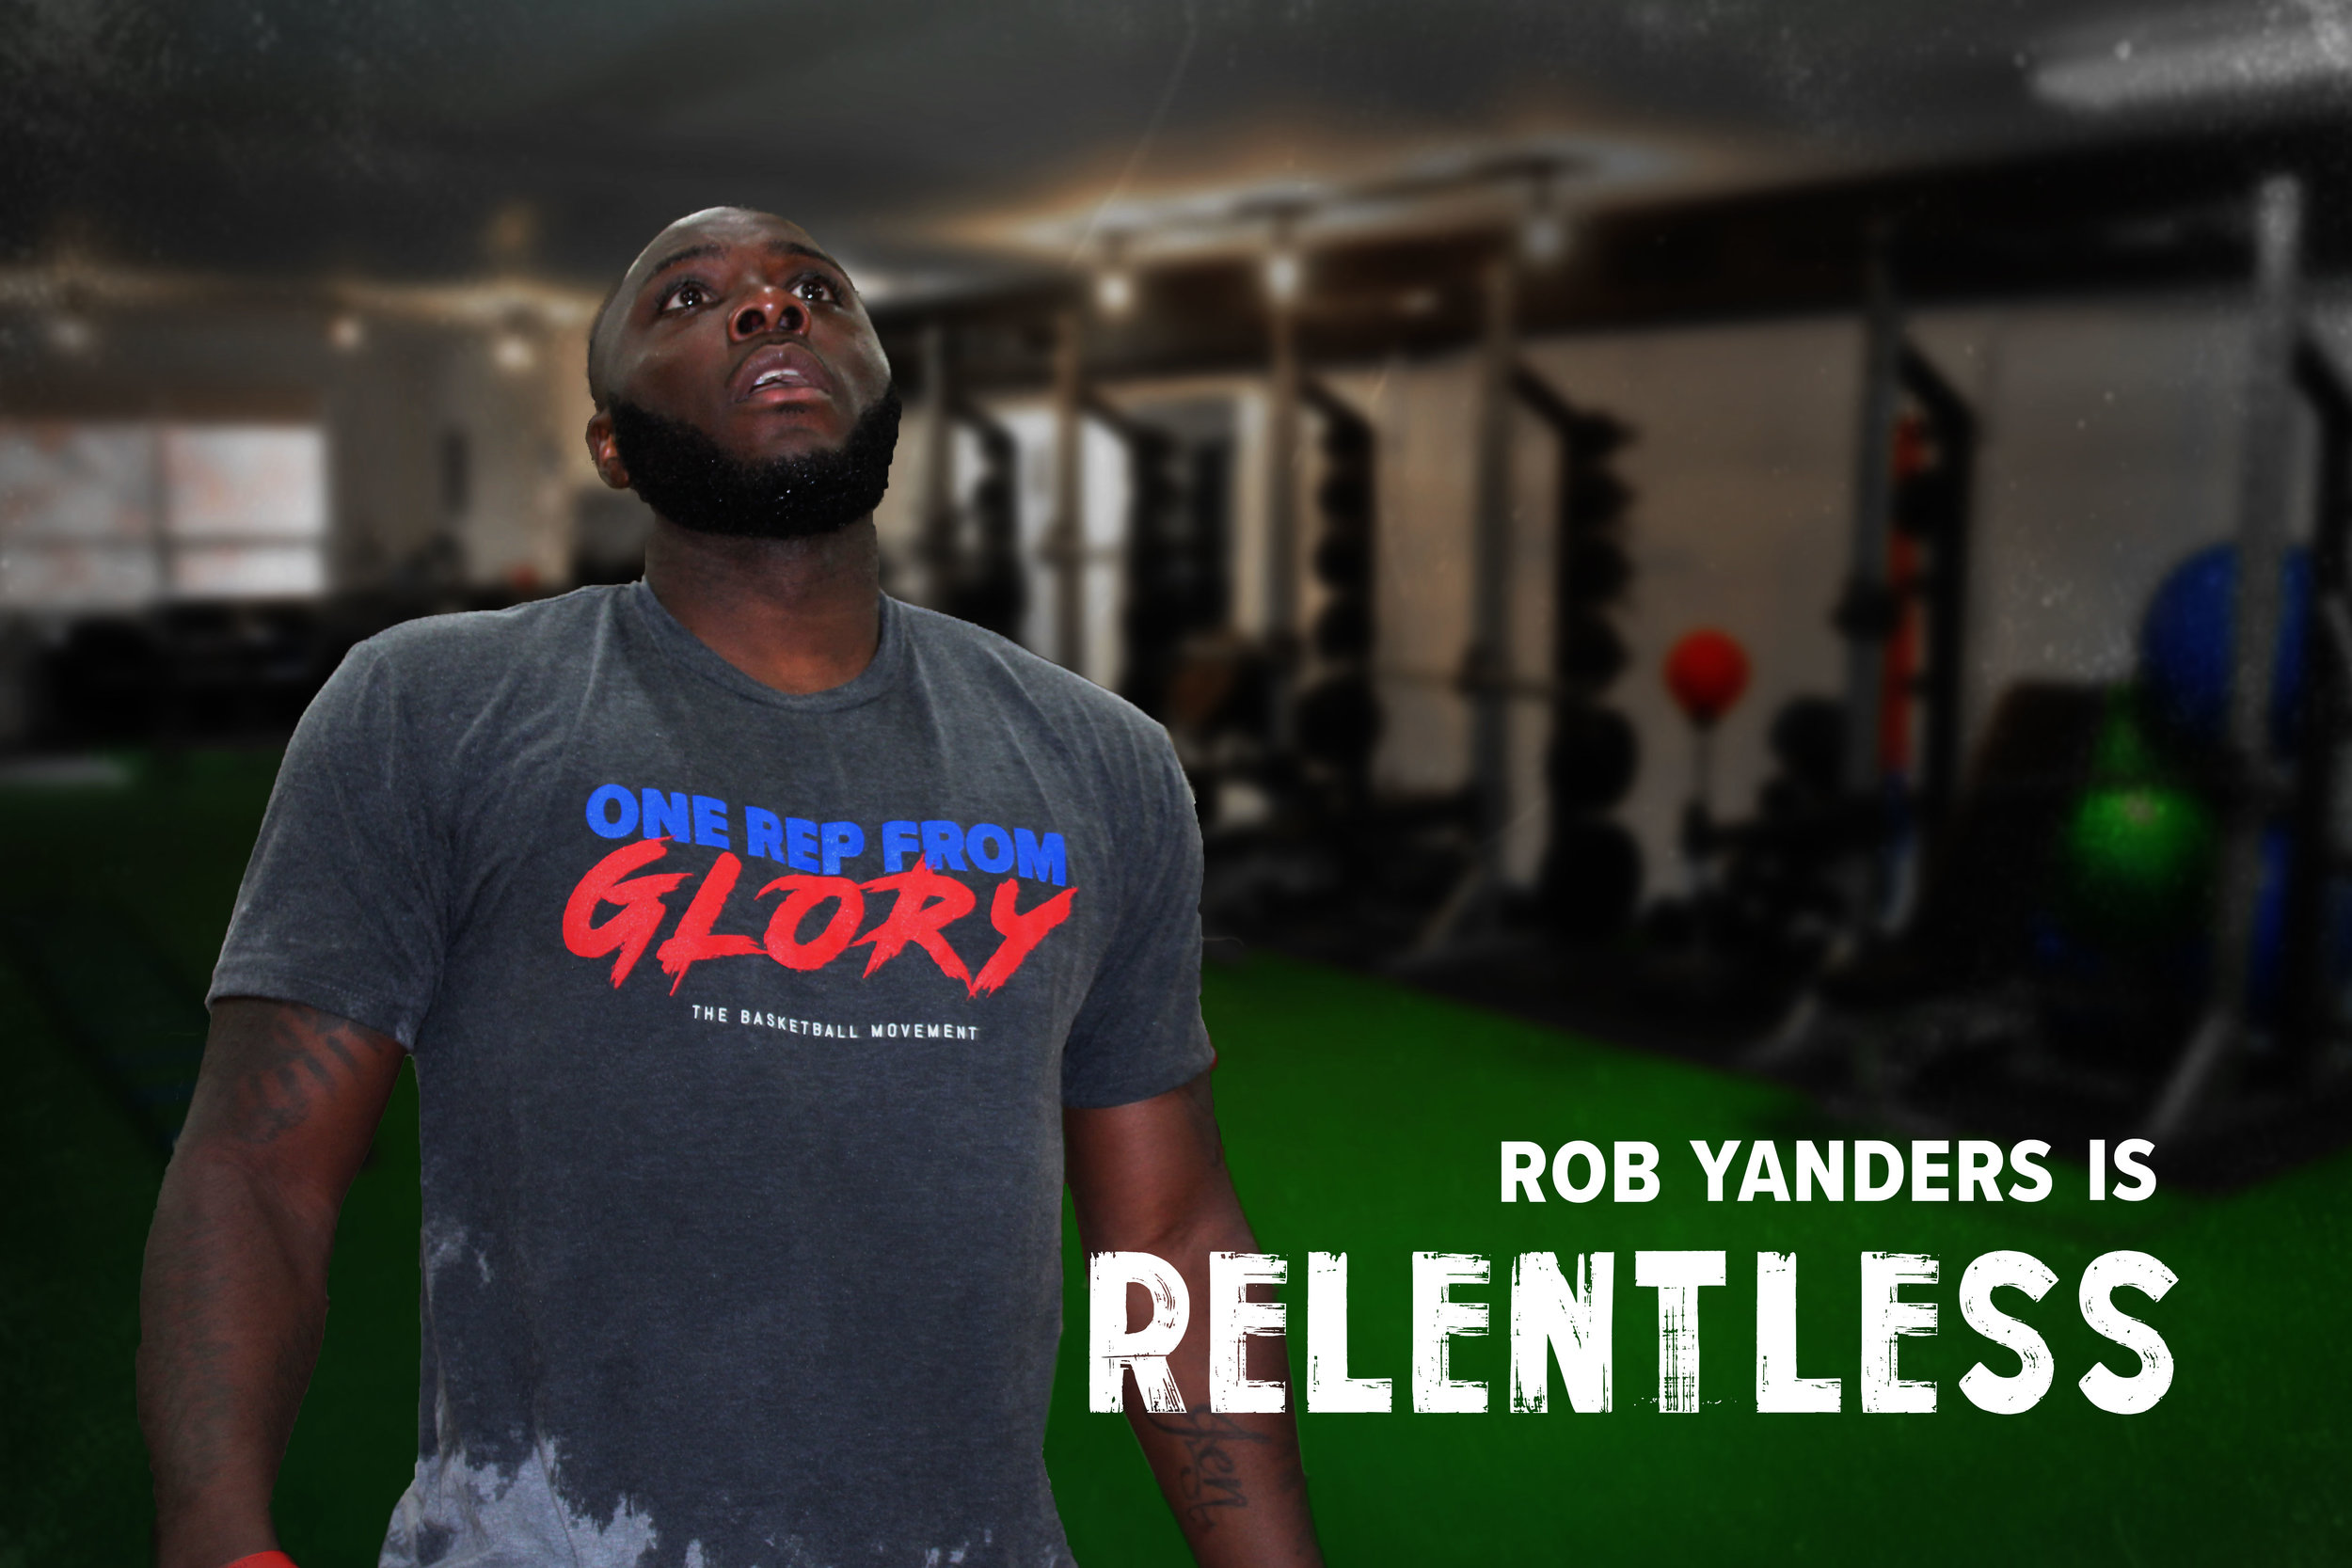 Rob-is-relentless.jpg